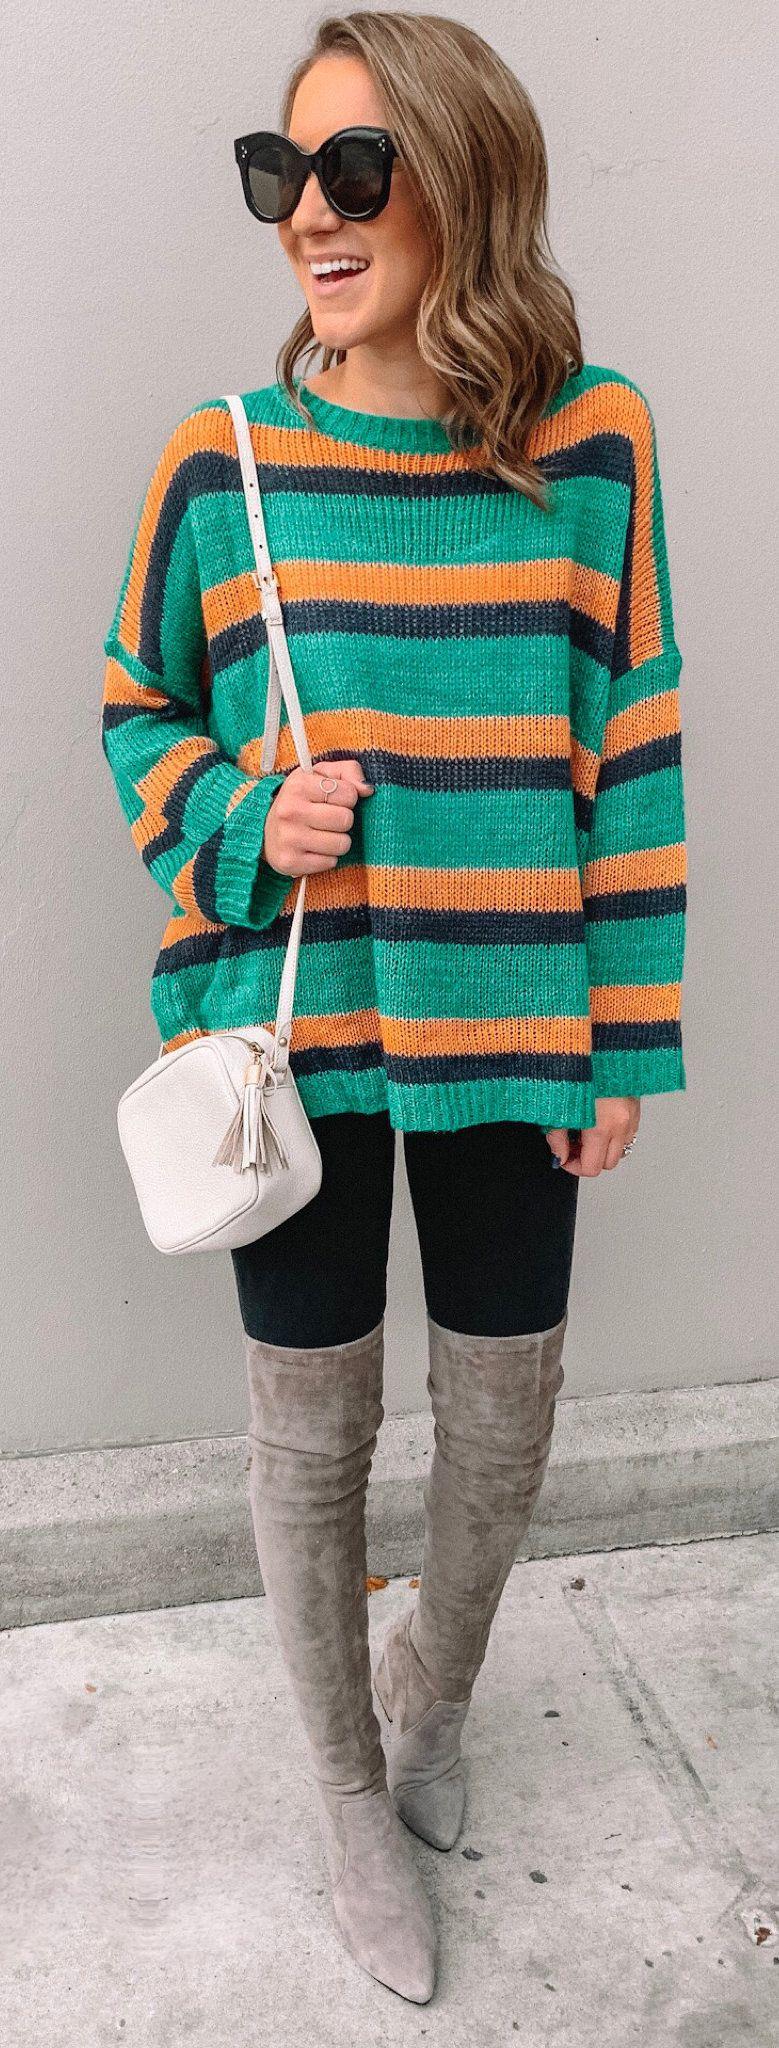 green, black, and orange stripe sweater